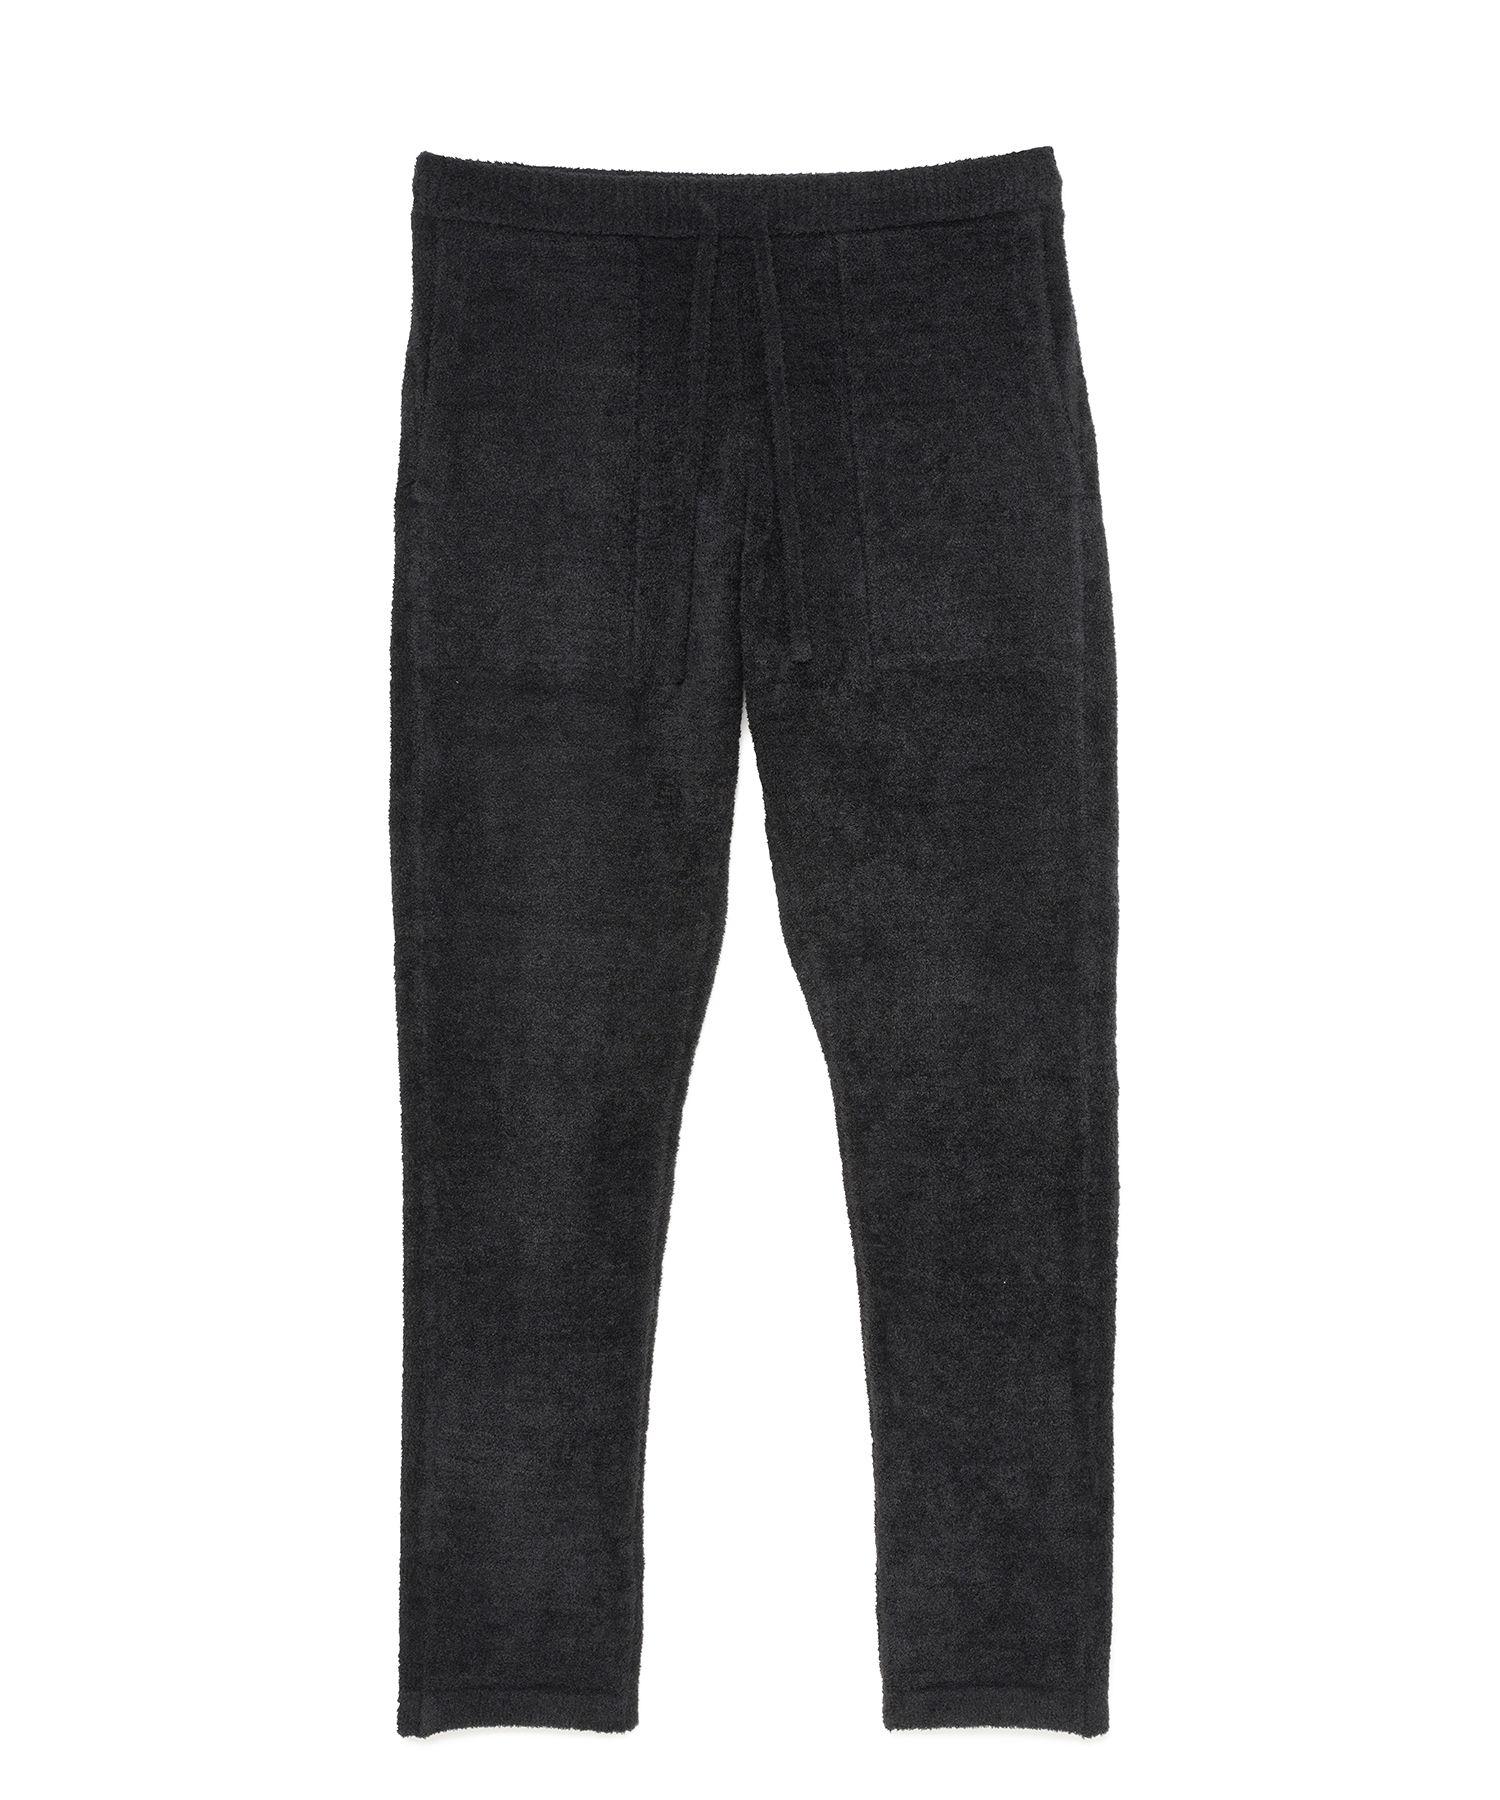 Seagreen MOCO room wear pants